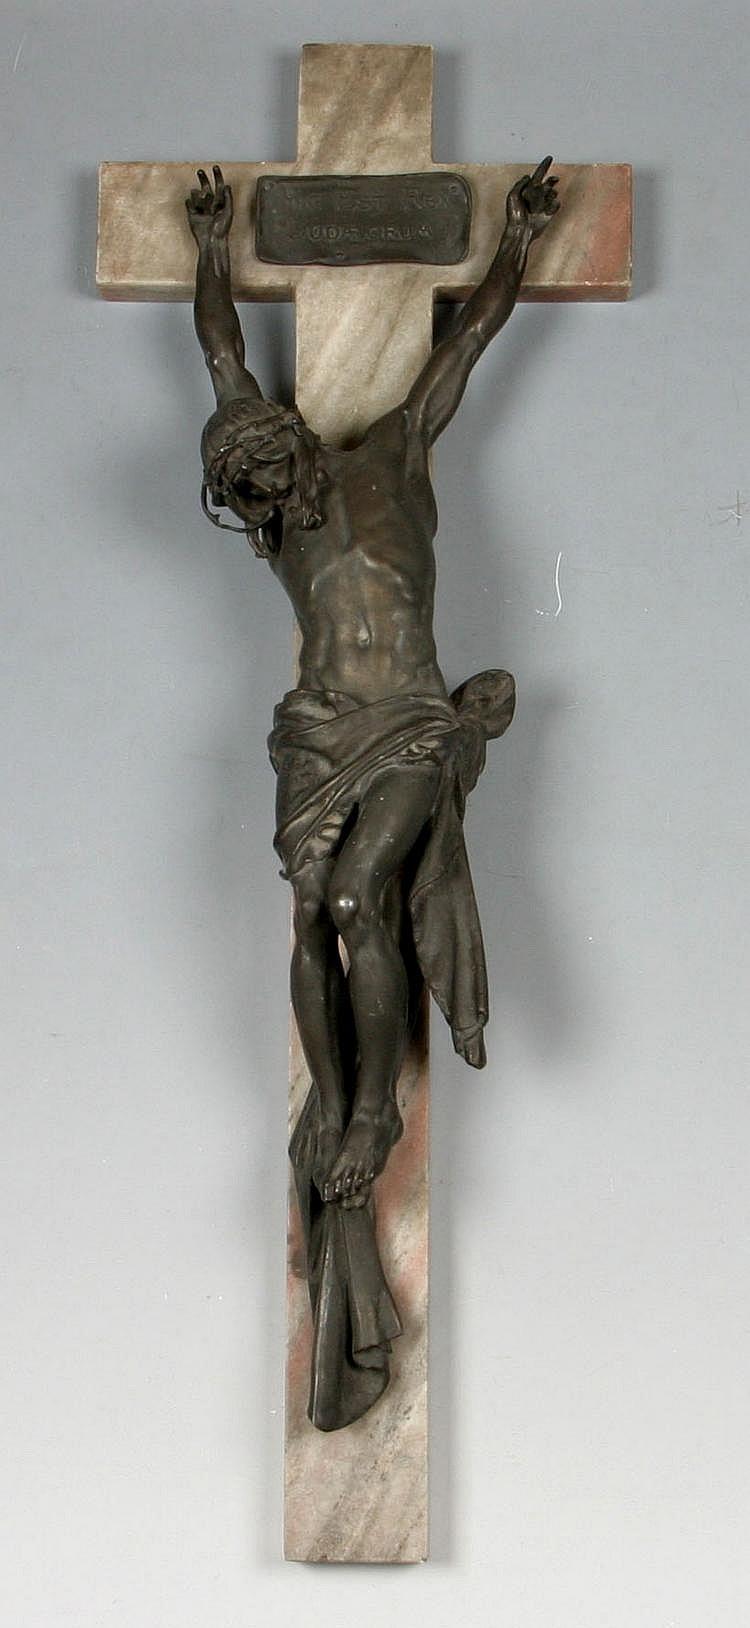 MYSLBEK Josef Vaclav (20. 6. 1848 Prague - 2. 6.